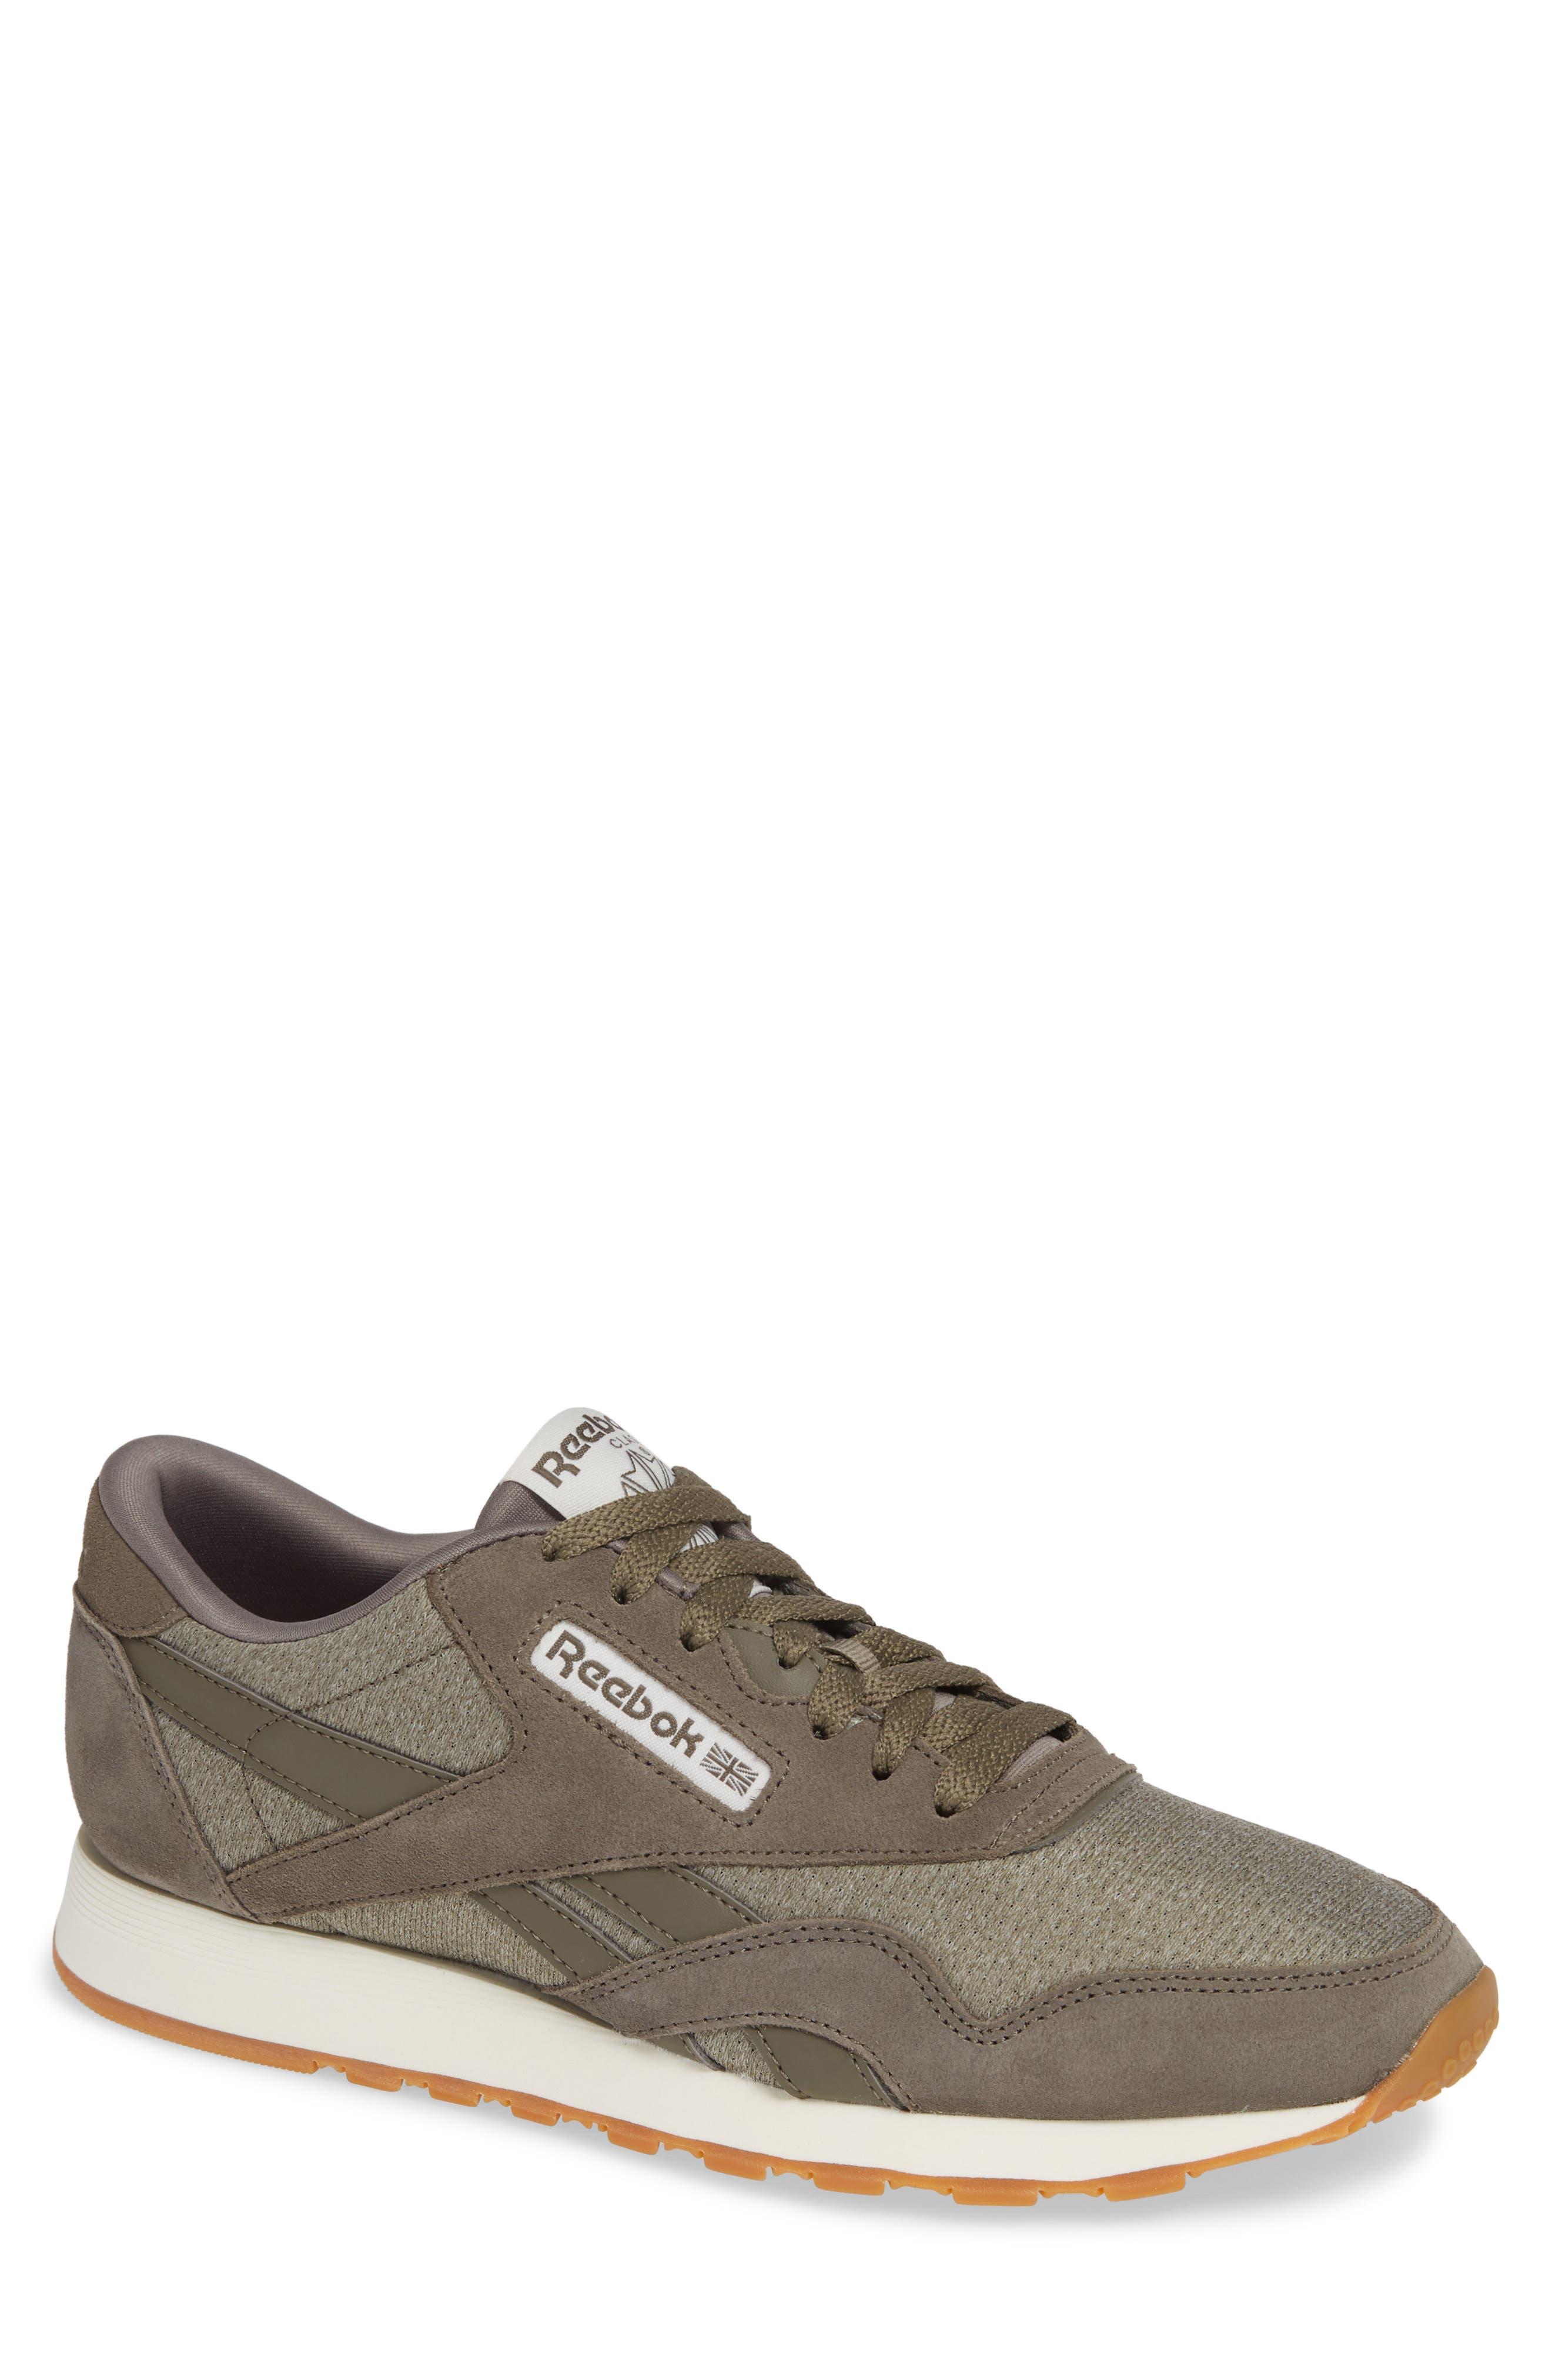 Classic Leather Nylon SG Sneaker,                             Main thumbnail 1, color,                             TERRAIN GREY/ CHALK